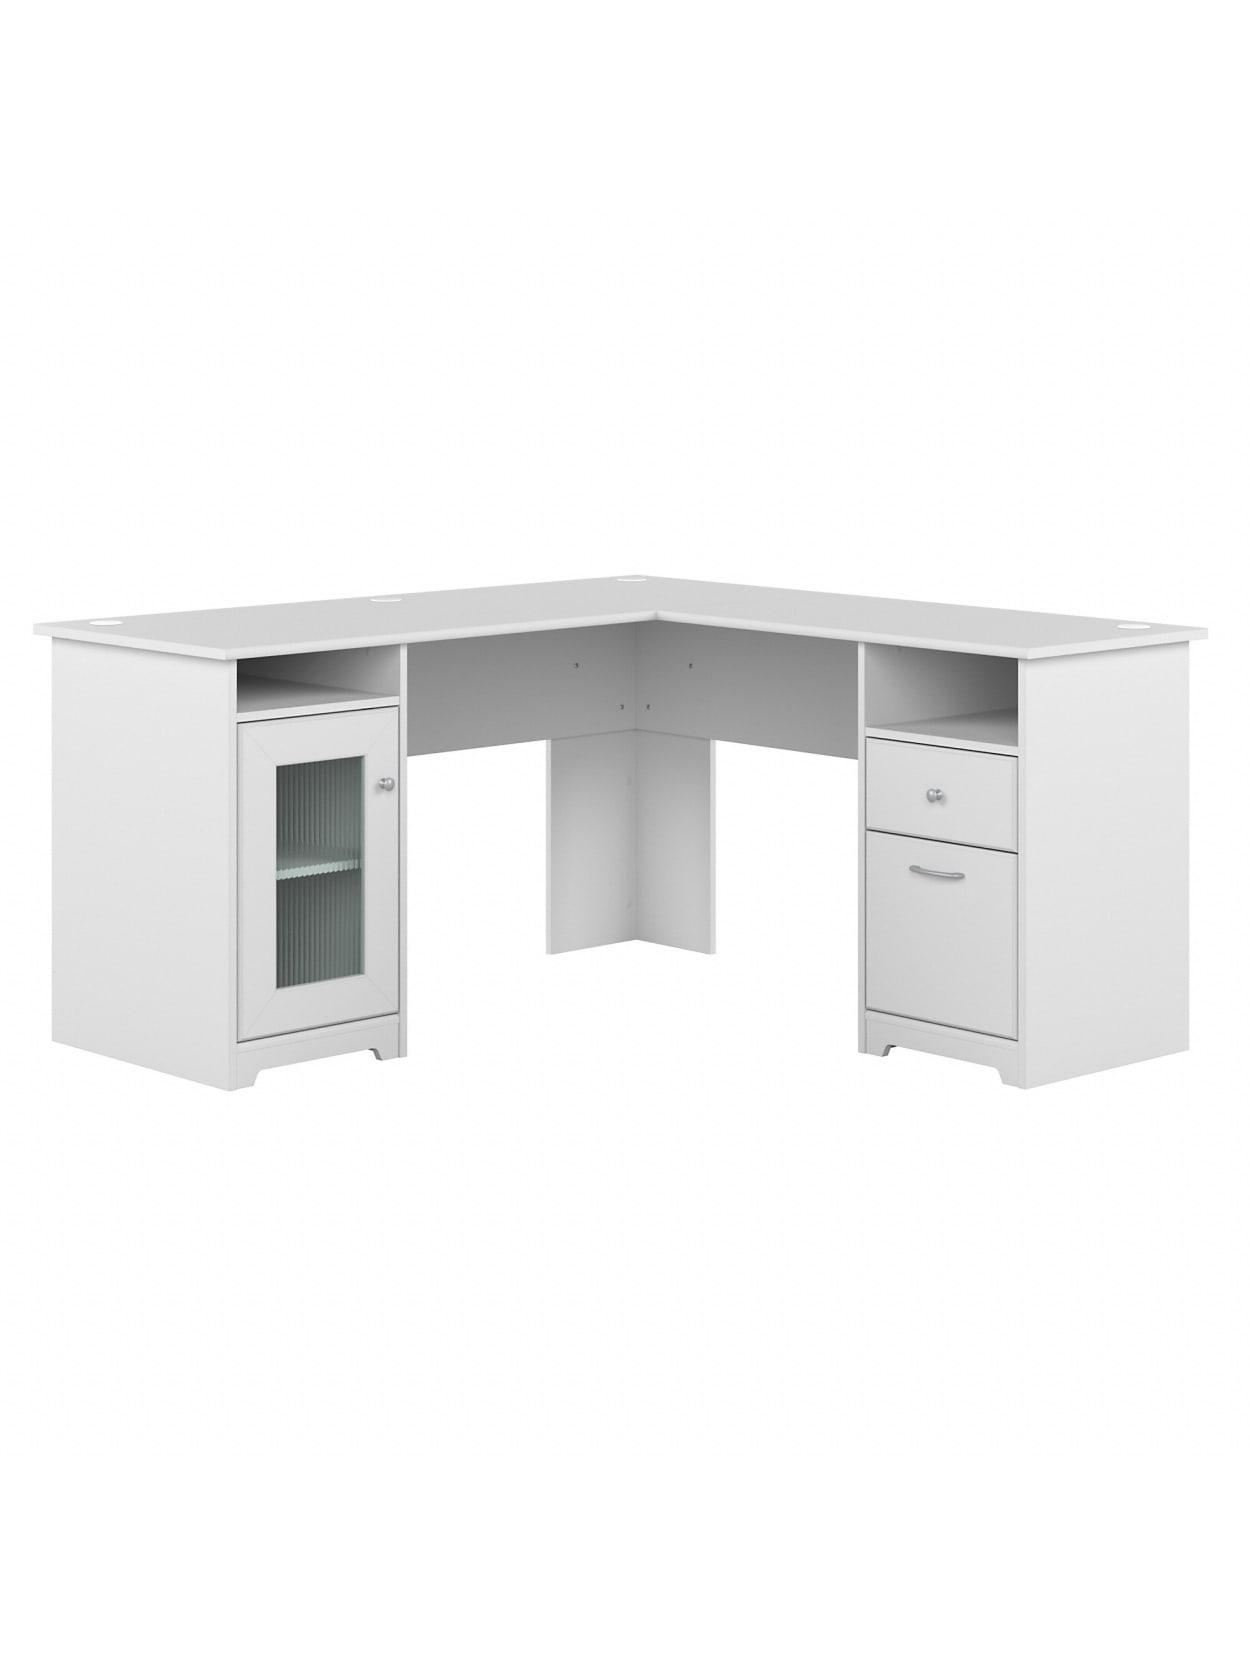 Bush Cabot L Shaped Desk 31 W White - Office Depot